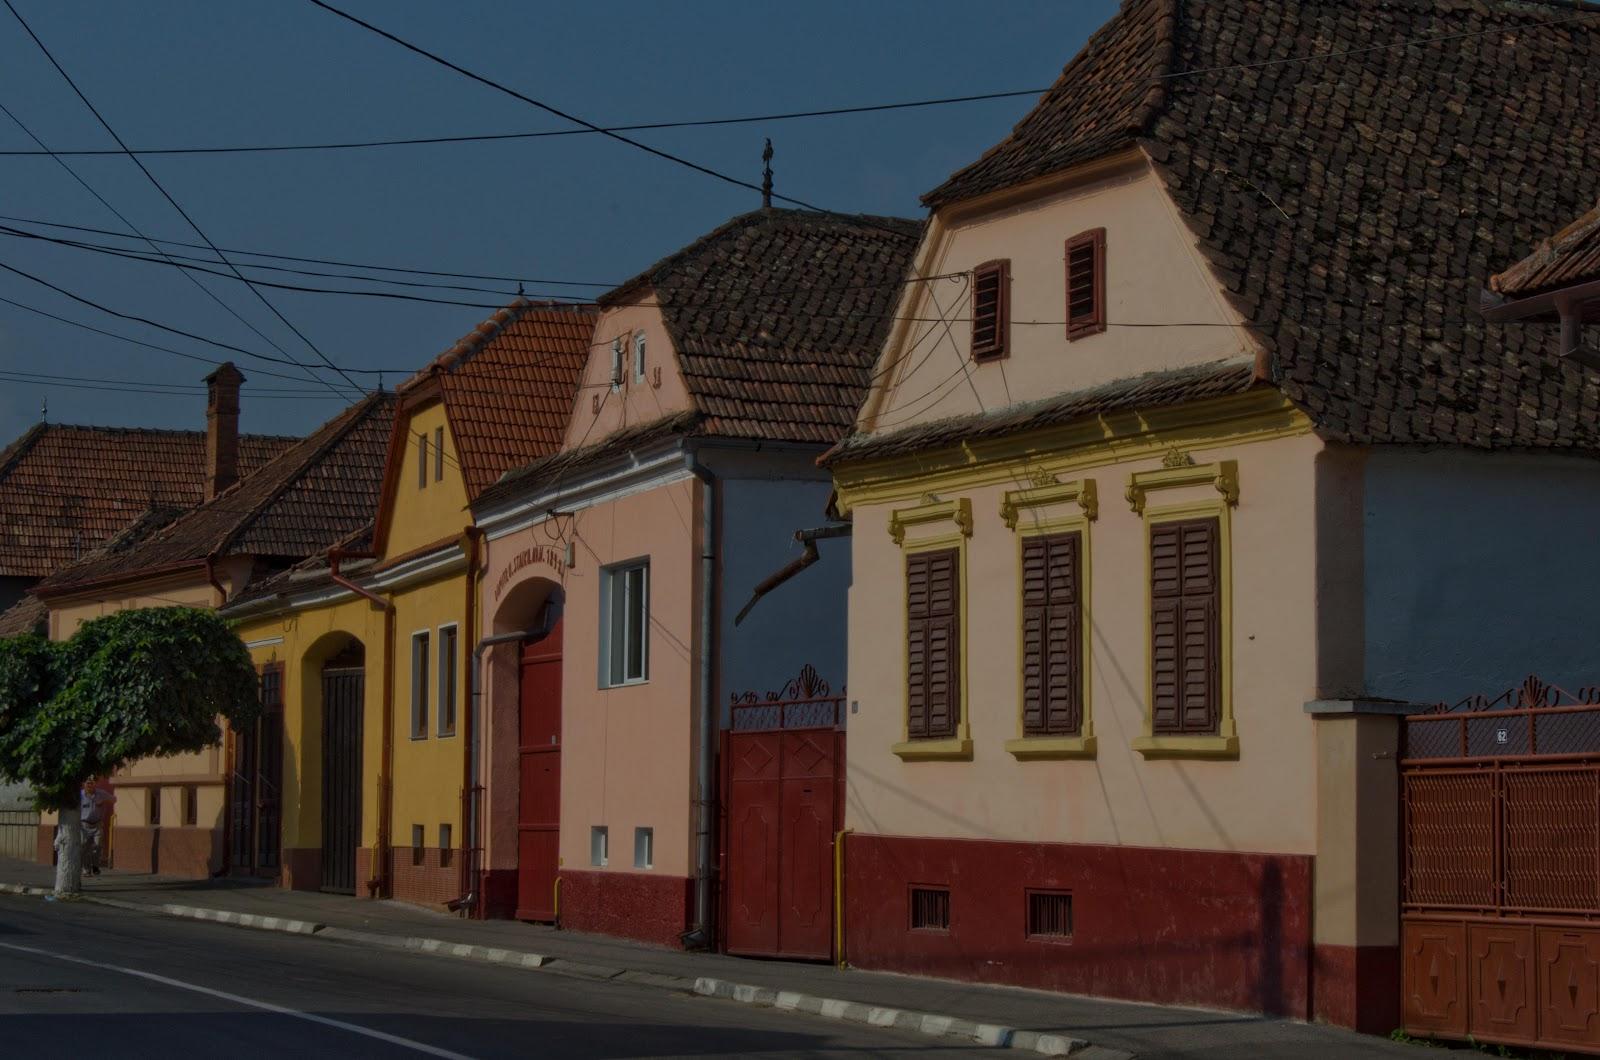 2012-06-2306rasnov-bran1